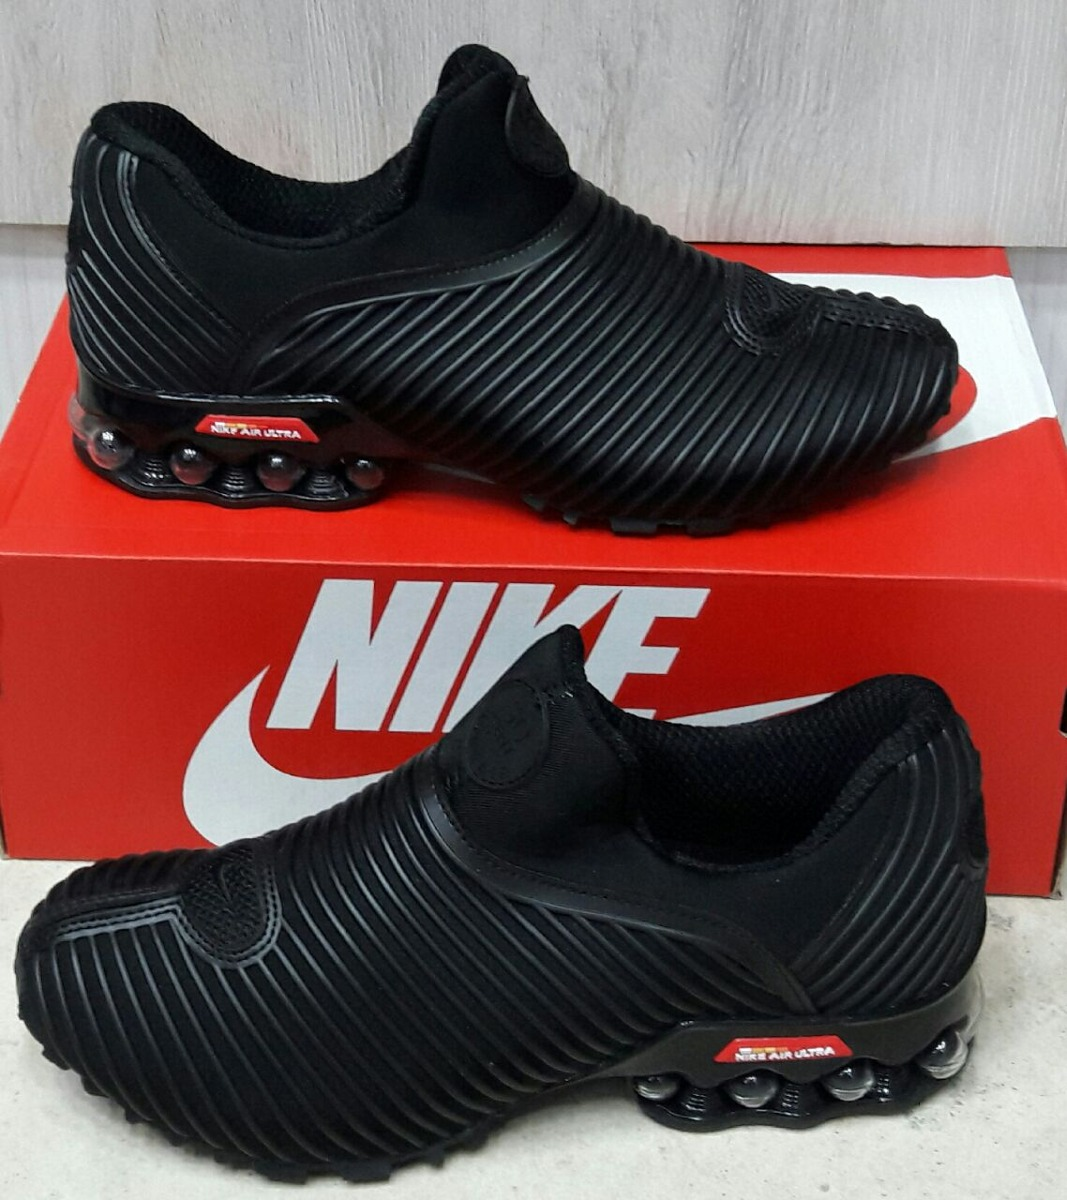 Zapatillas Nike Air 50 Cent Black Red - Hombre -   170.000 en ... 449276f5e